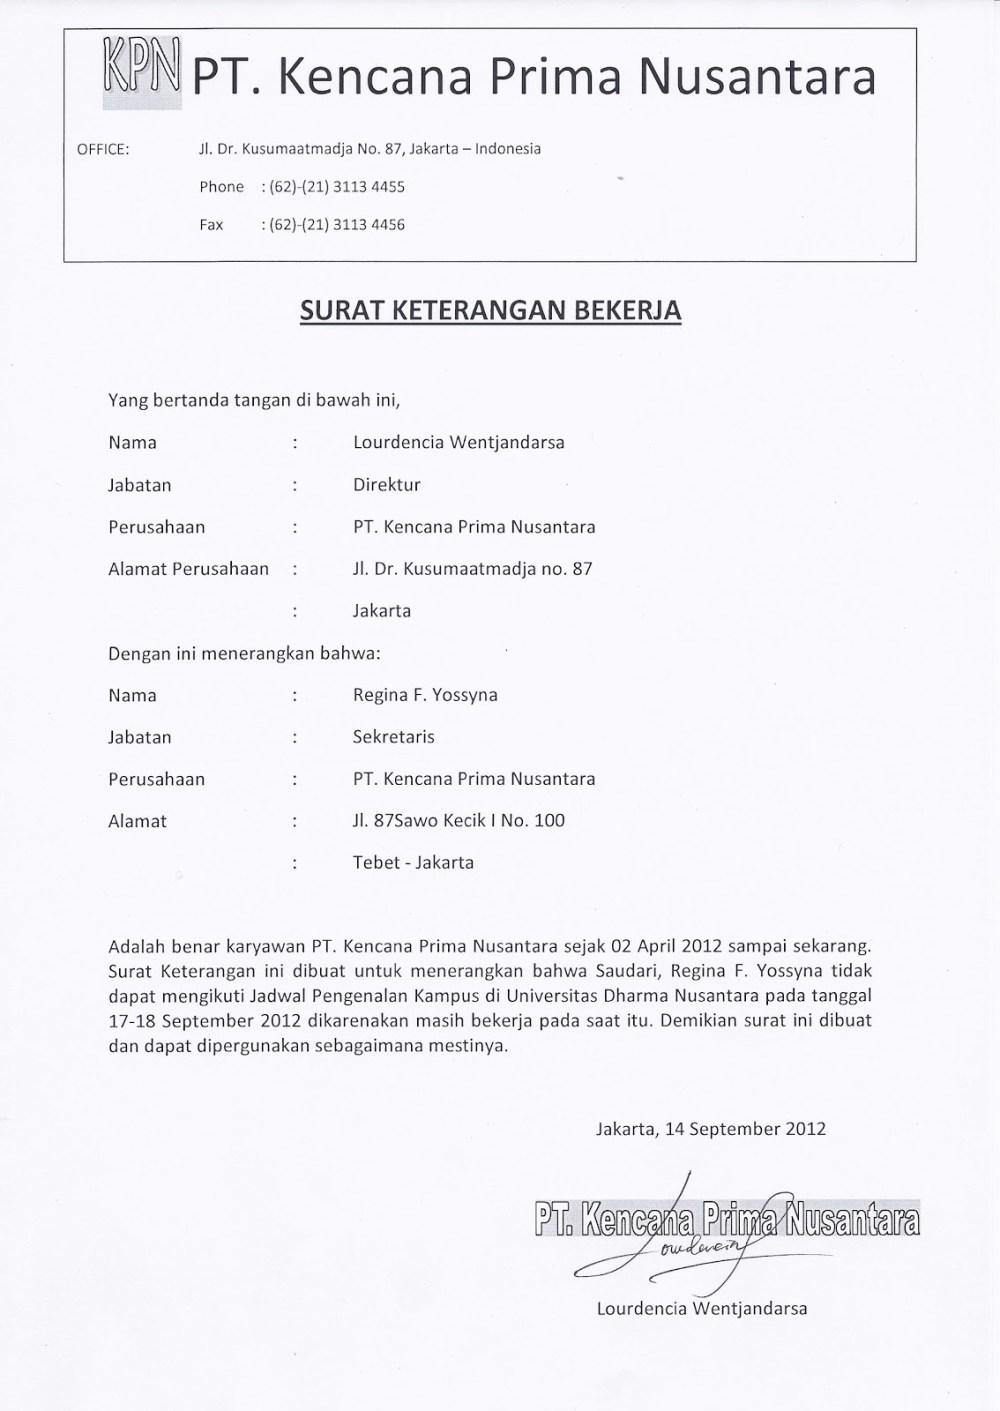 4. Contoh Surat Keterangan Kerja Untuk Kuliah Terkait Penggantian Jadwal